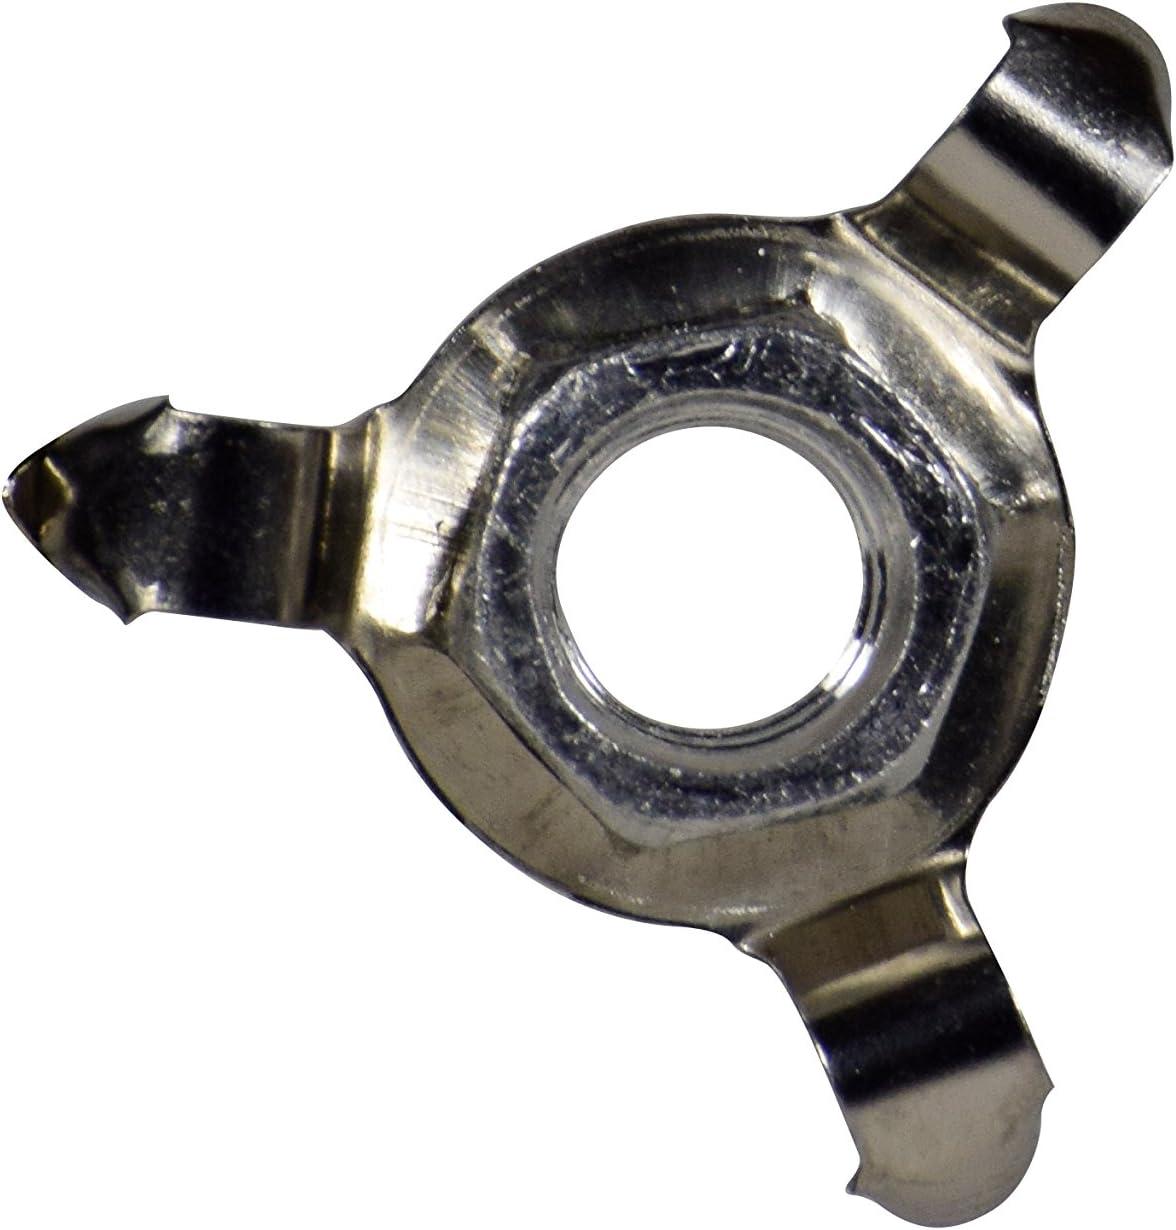 mirro pressure cooker nut 7117001173